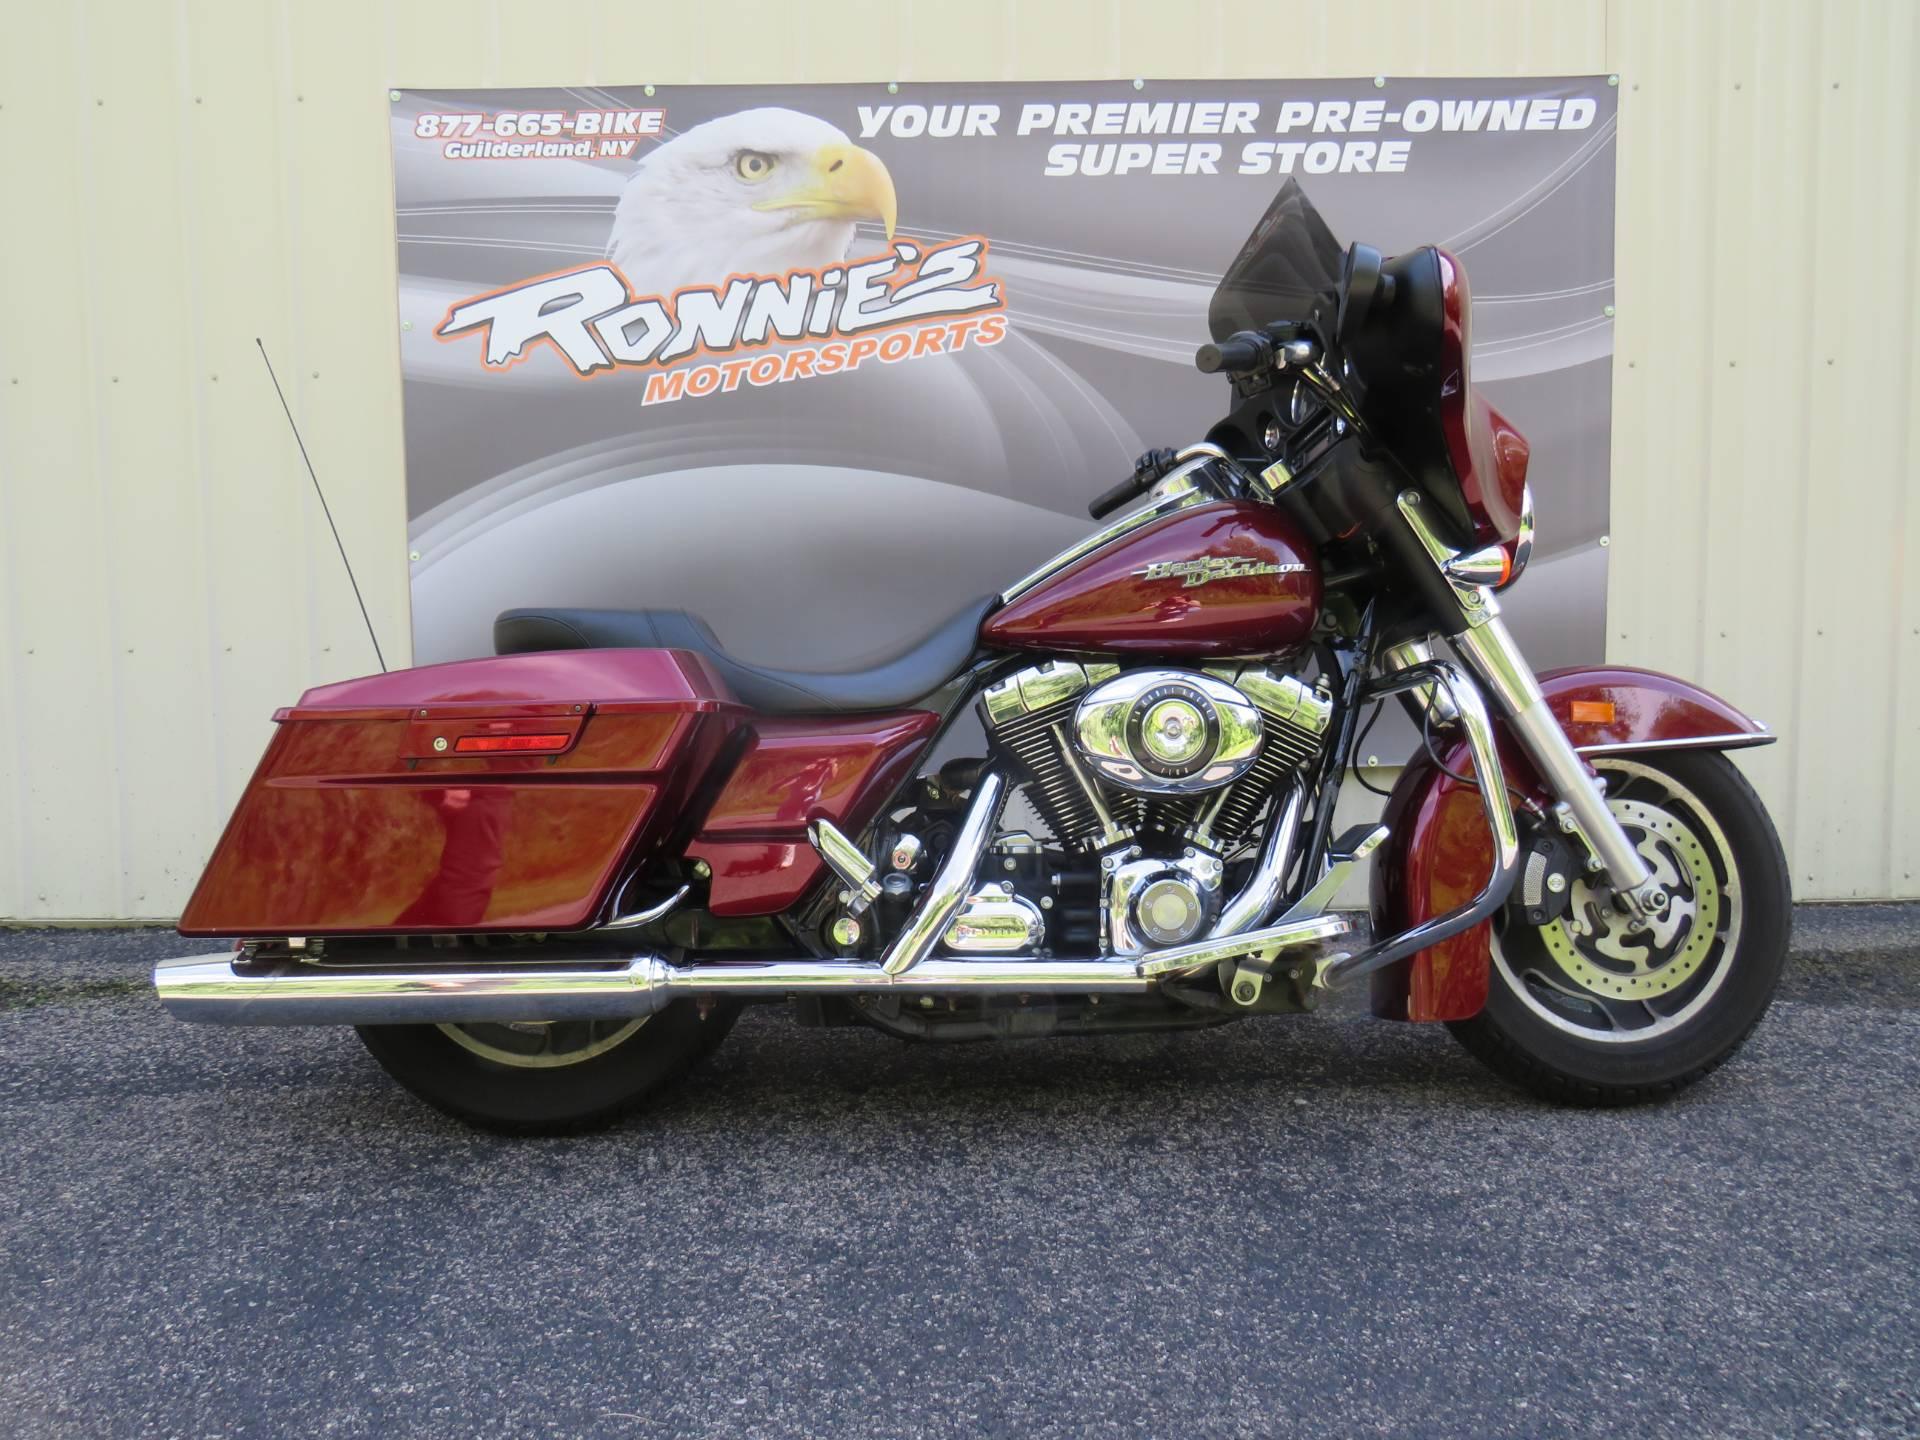 Used 2008 Harley-Davidson Street Glide® Motorcycles in